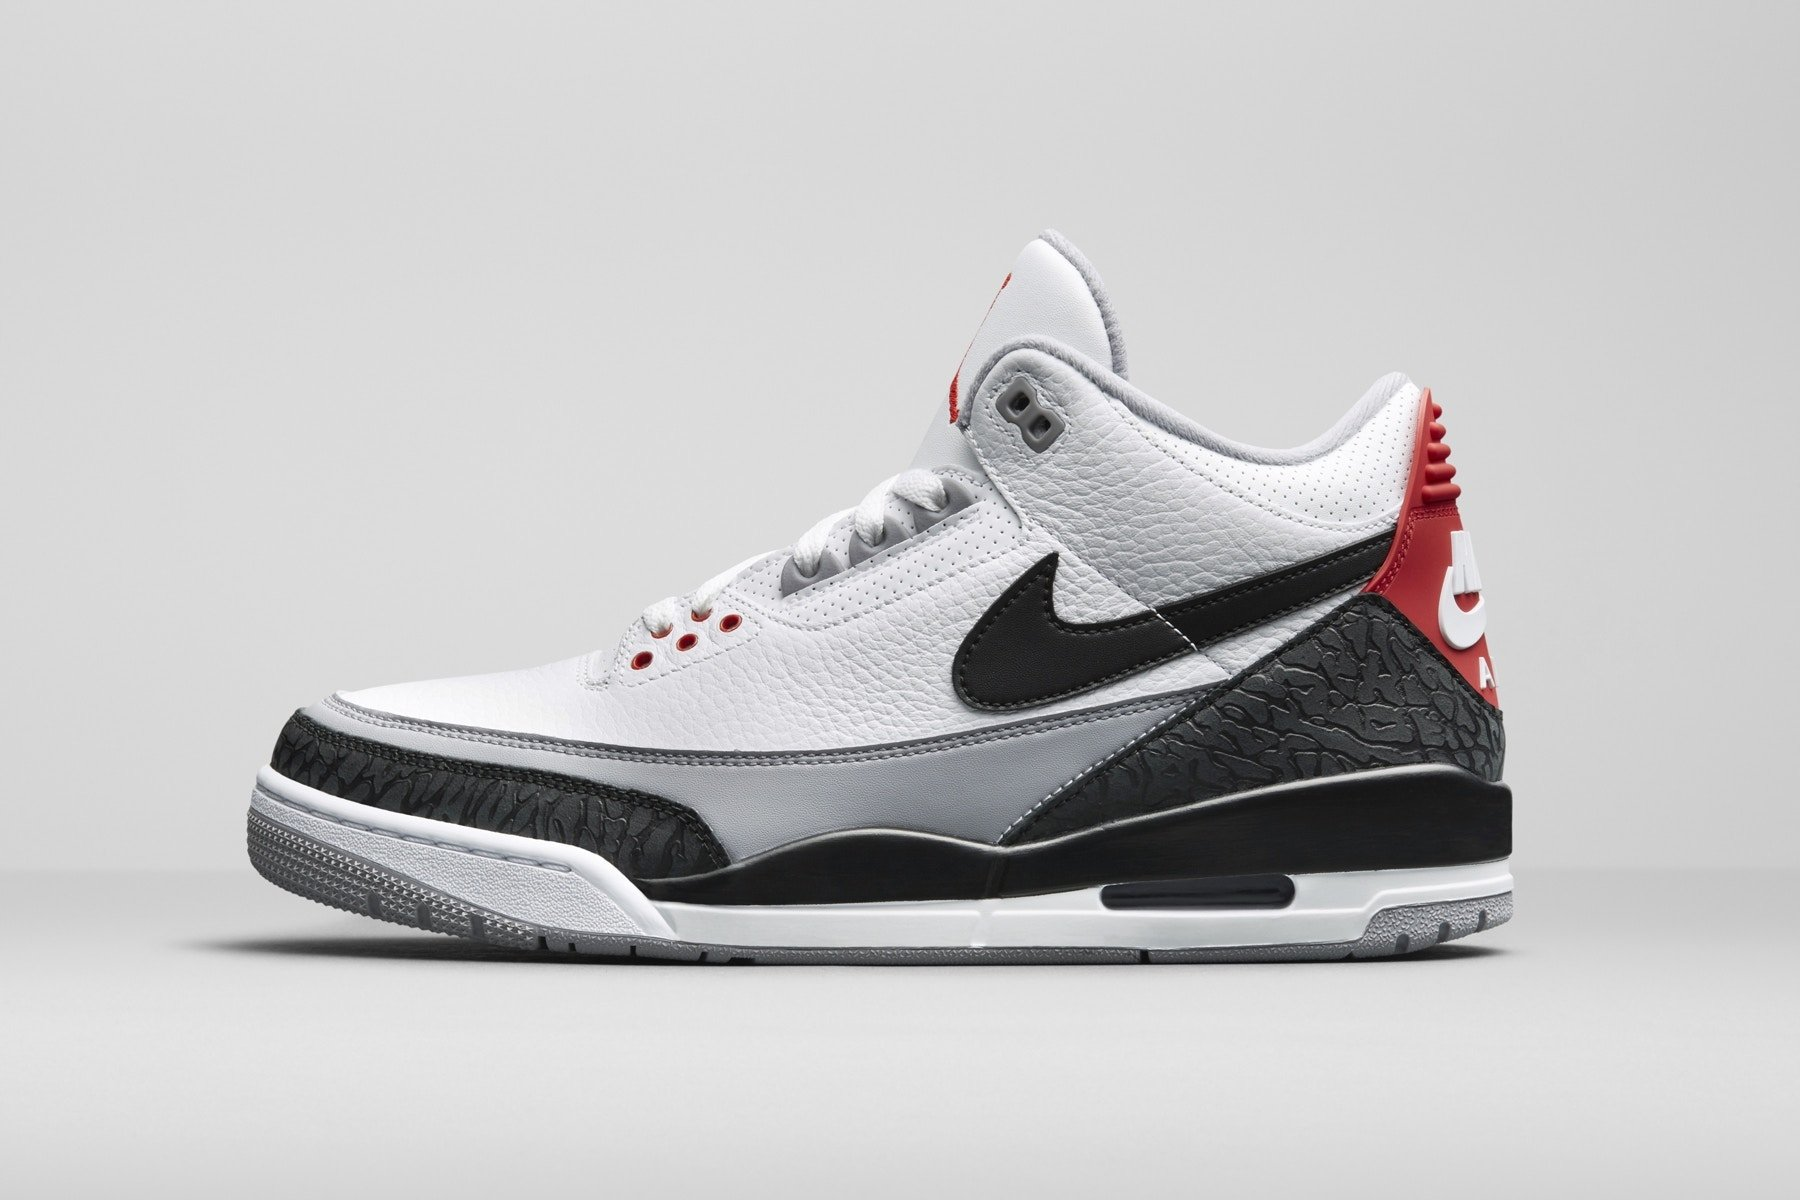 Nike Air Jordan III Tinker Basketball Schuh Snapchat Vorbestellung grau weiß rot